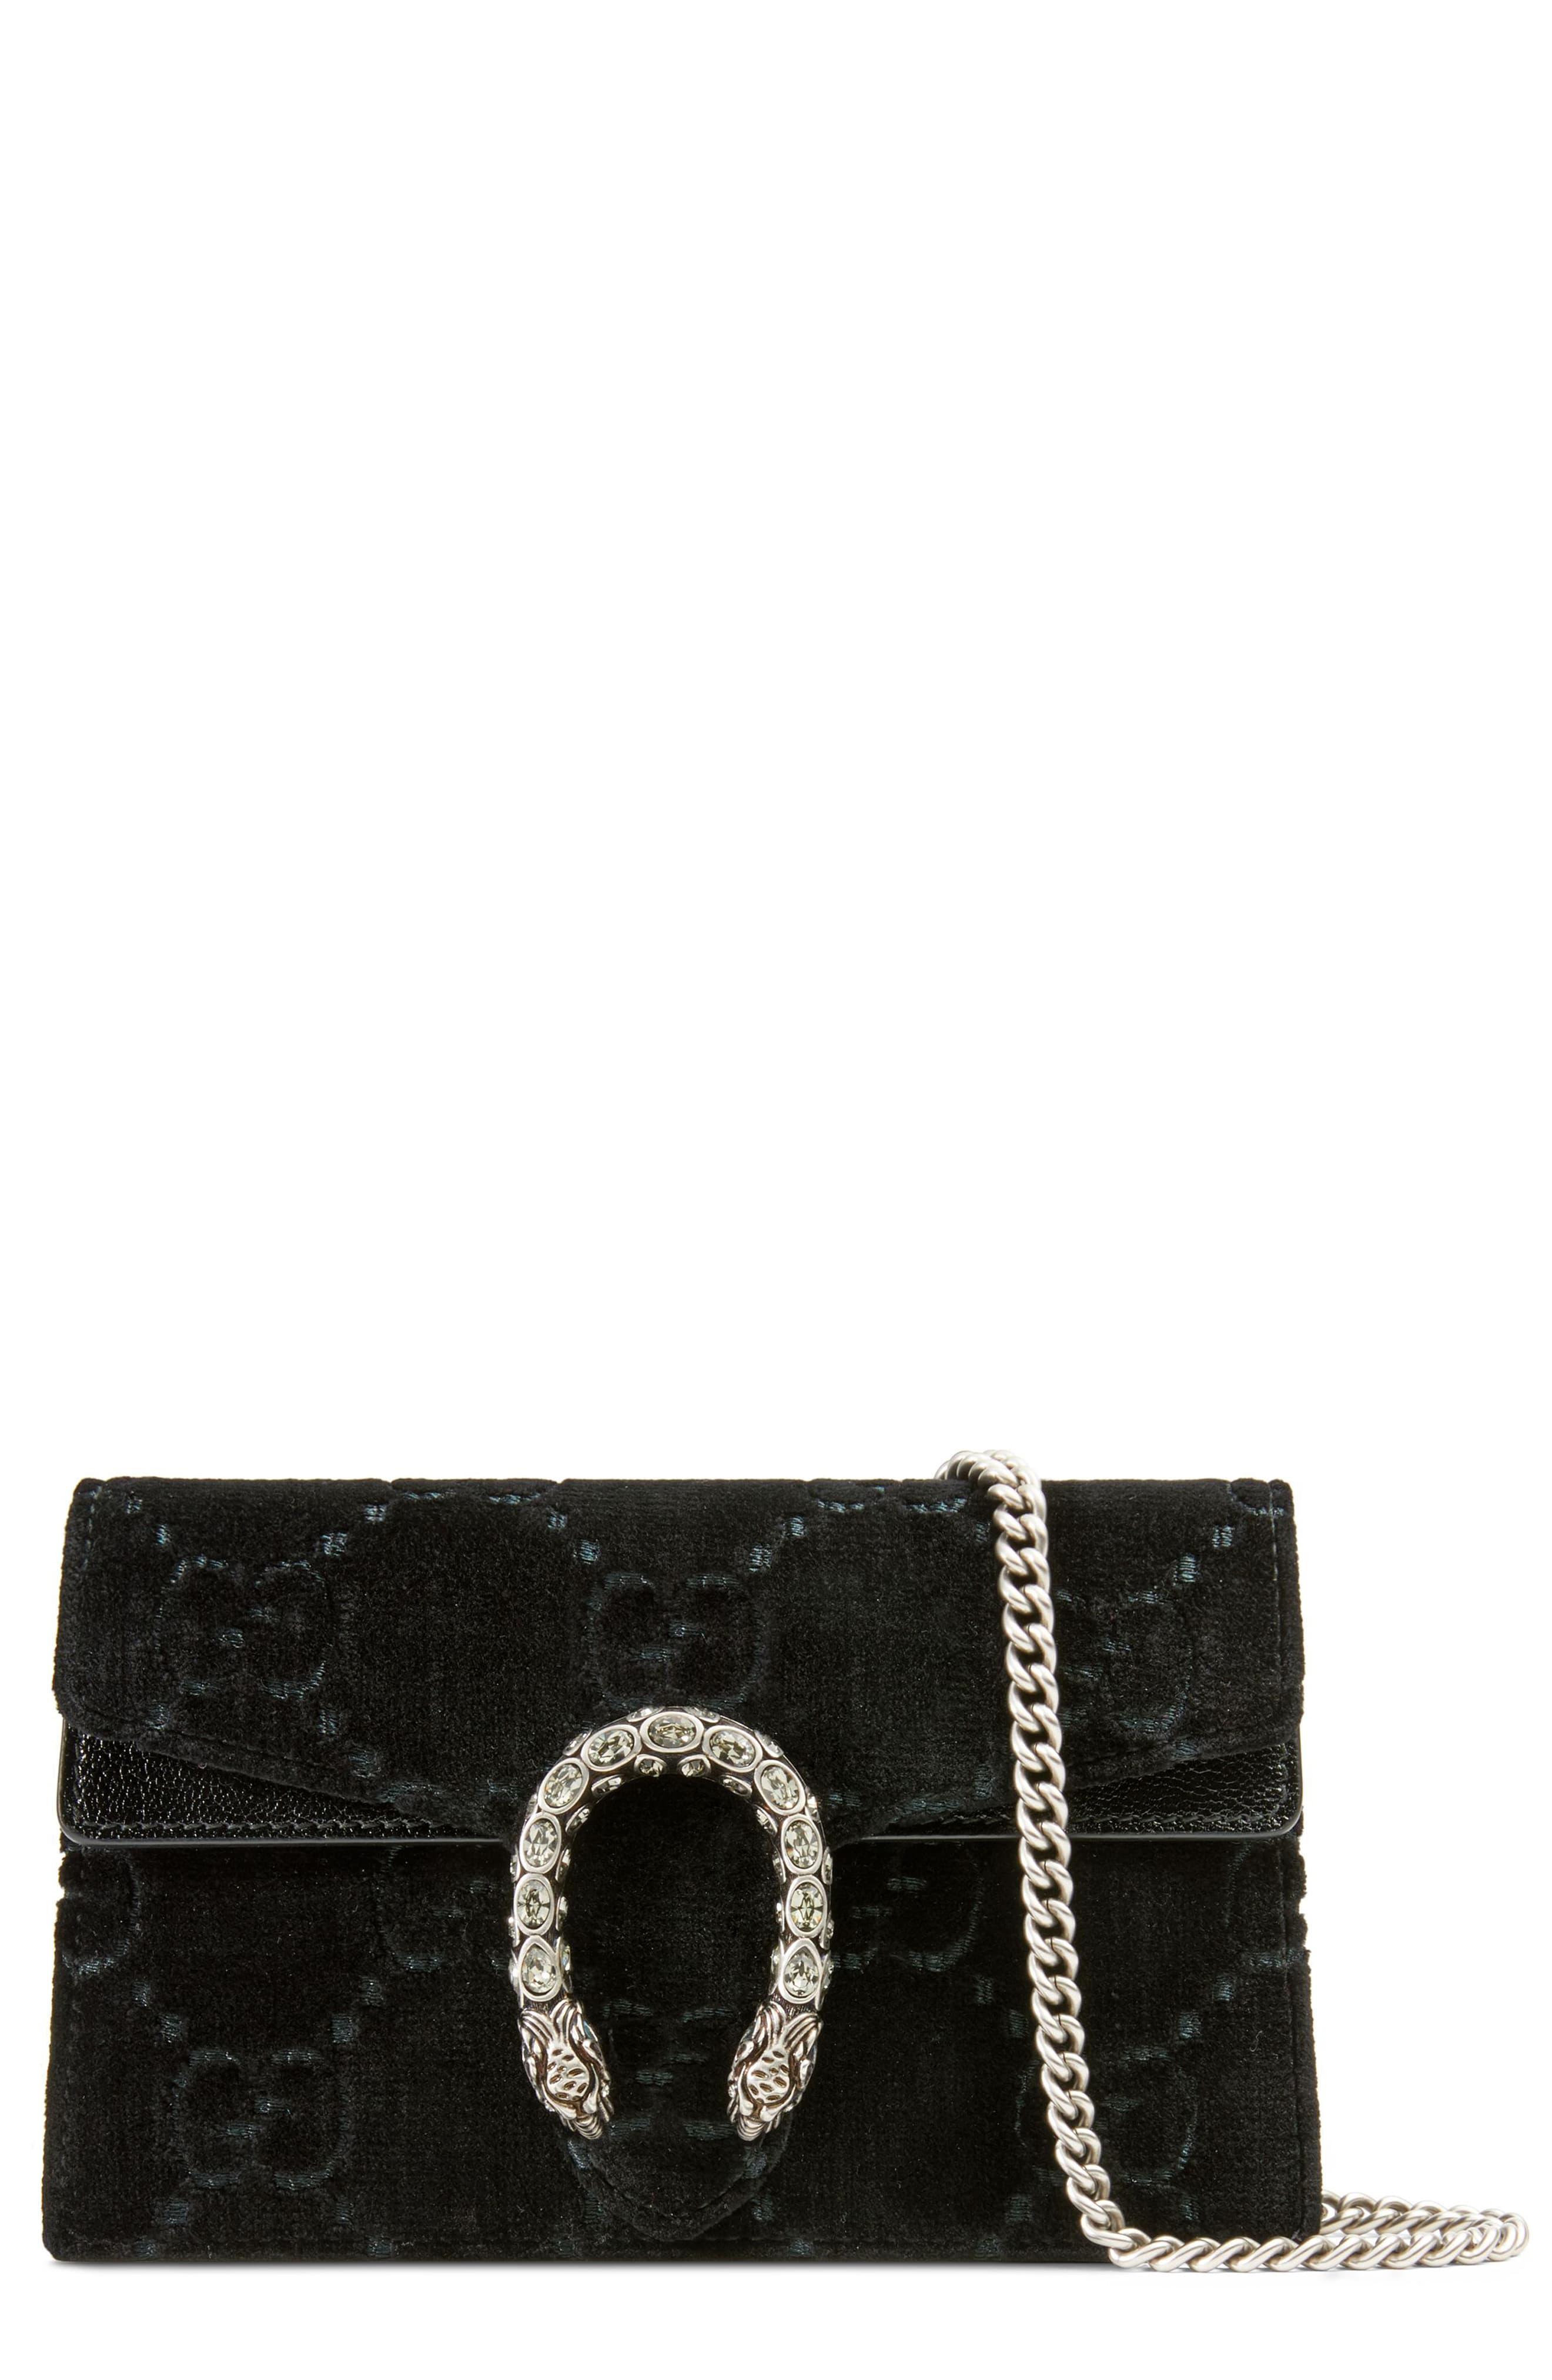 7251bd91abceed Gucci Supermini Dionysus Double G Velvet Shoulder Bag - in Black - Lyst